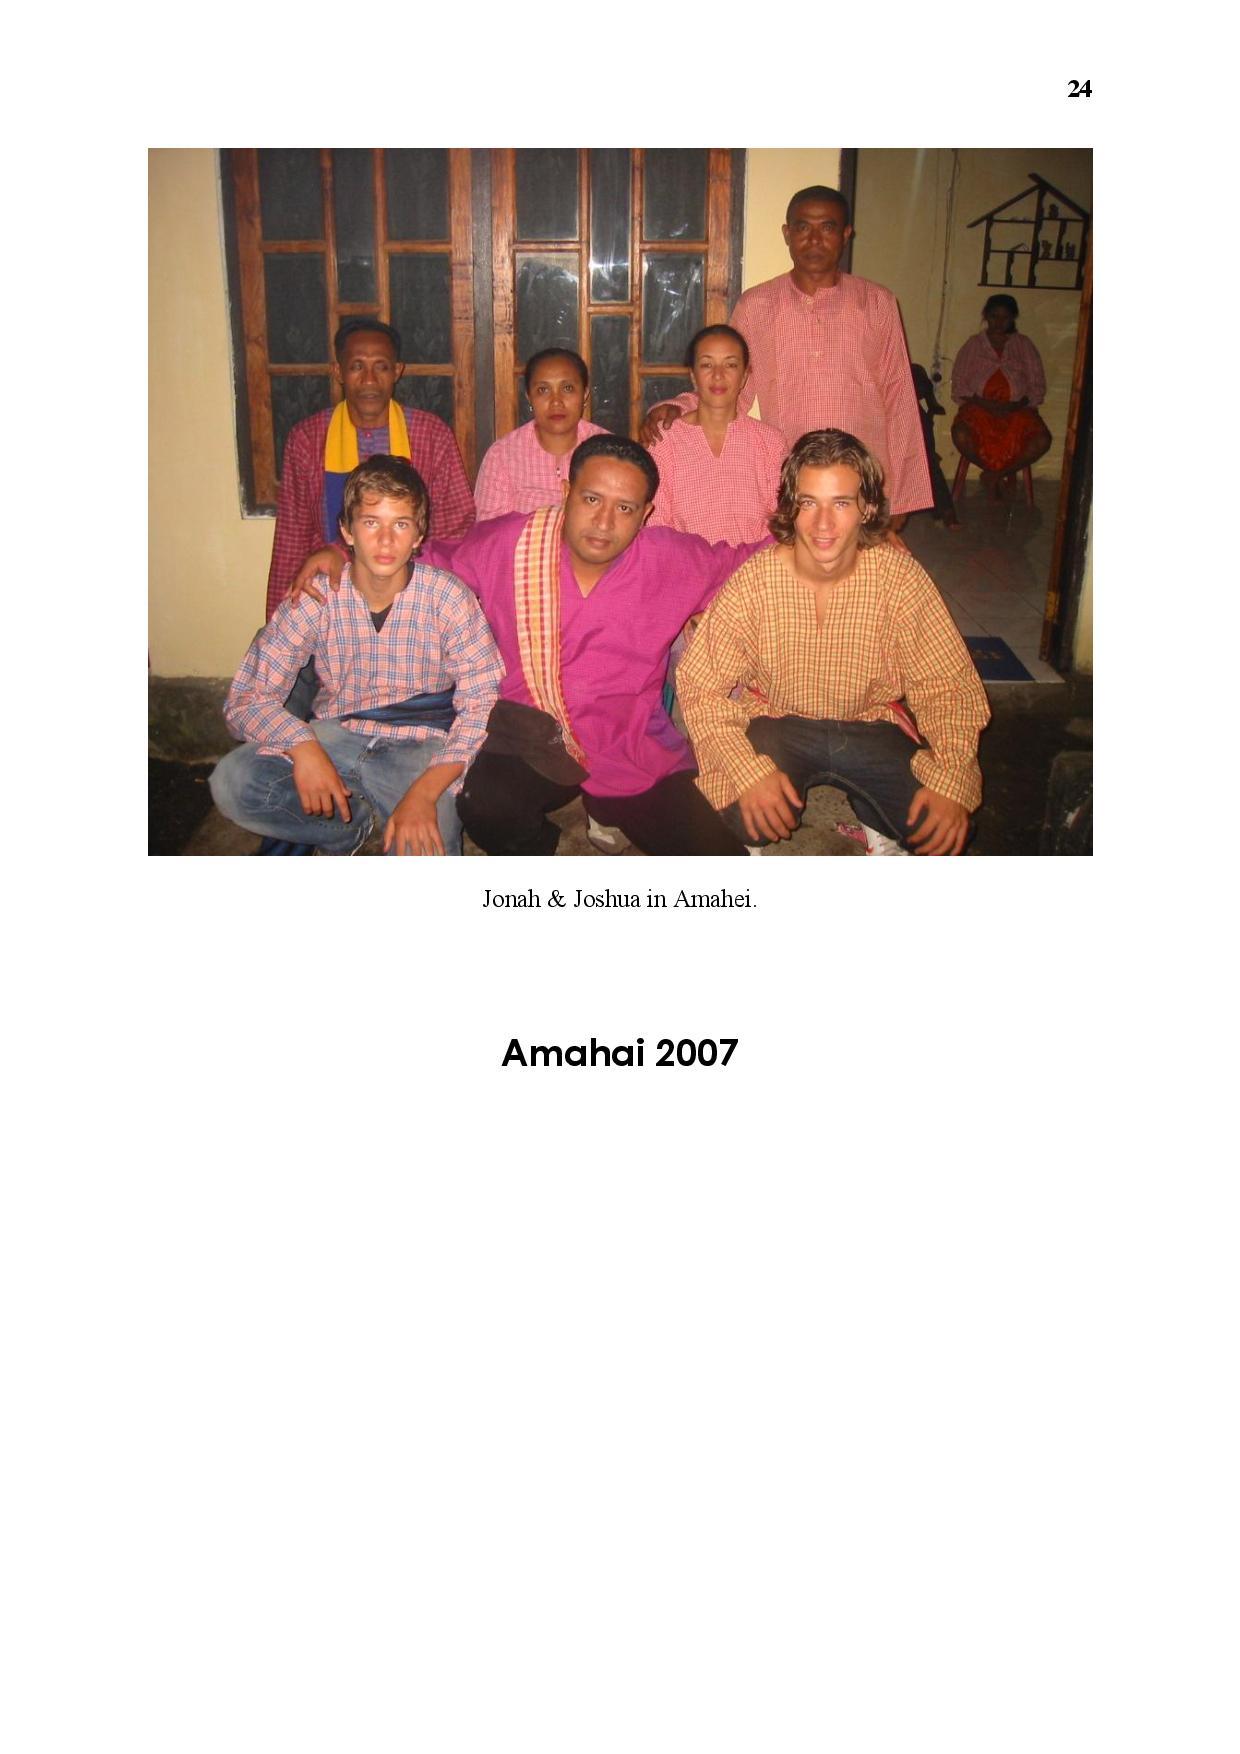 Saka Mese 3e jaargang nr. 02-2007 definitieve webversie-page-024